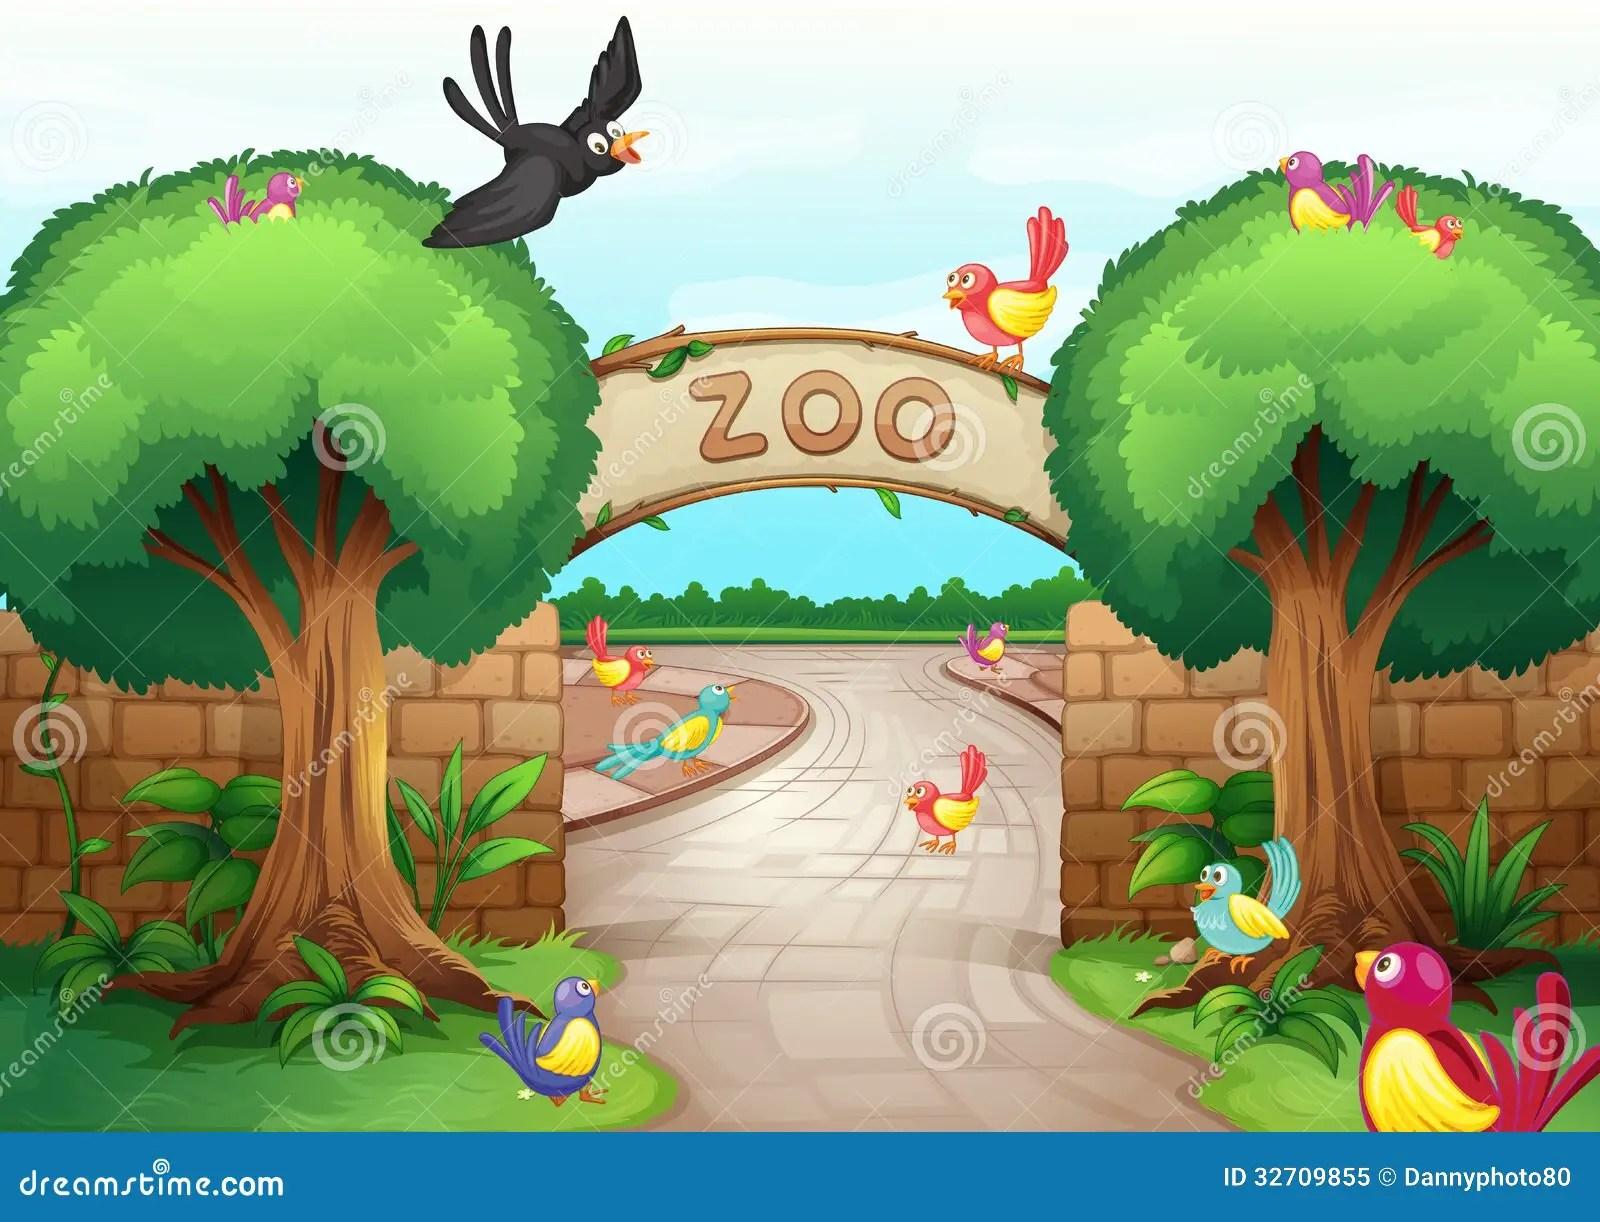 hight resolution of zoo scene